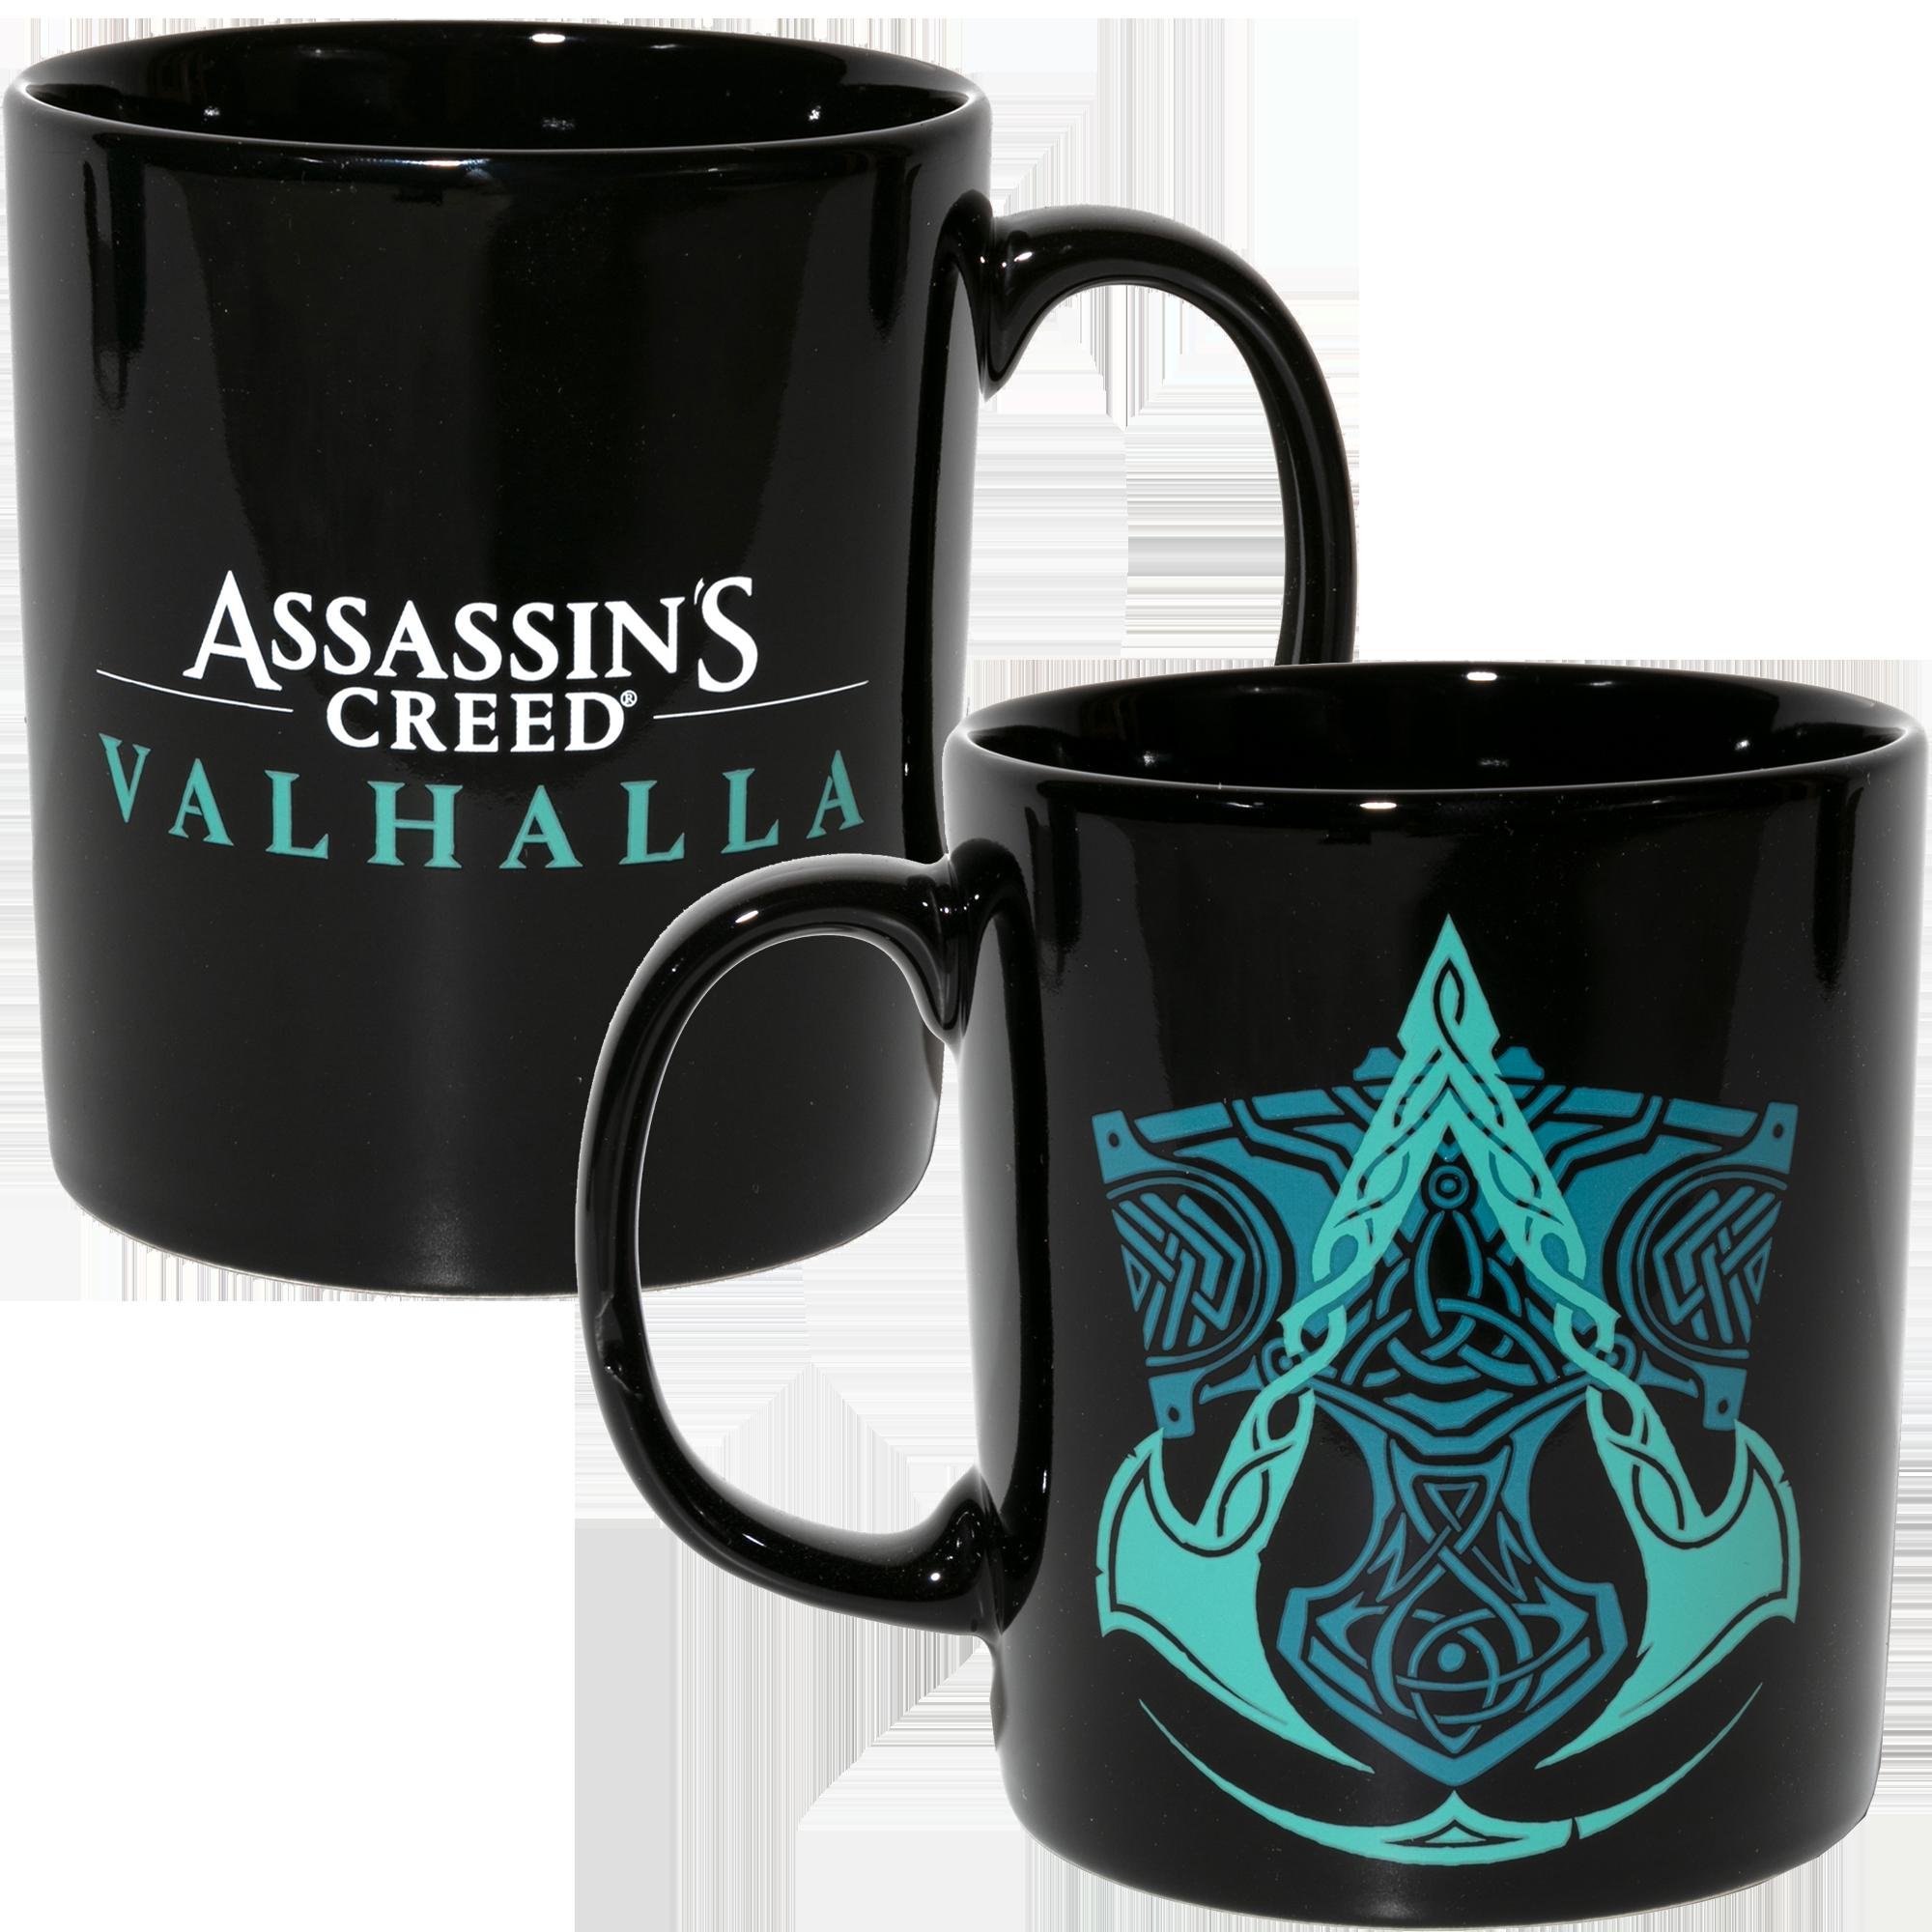 Product image of the Assassin's Creed Valhalla Morning Viking Ceramic Mug